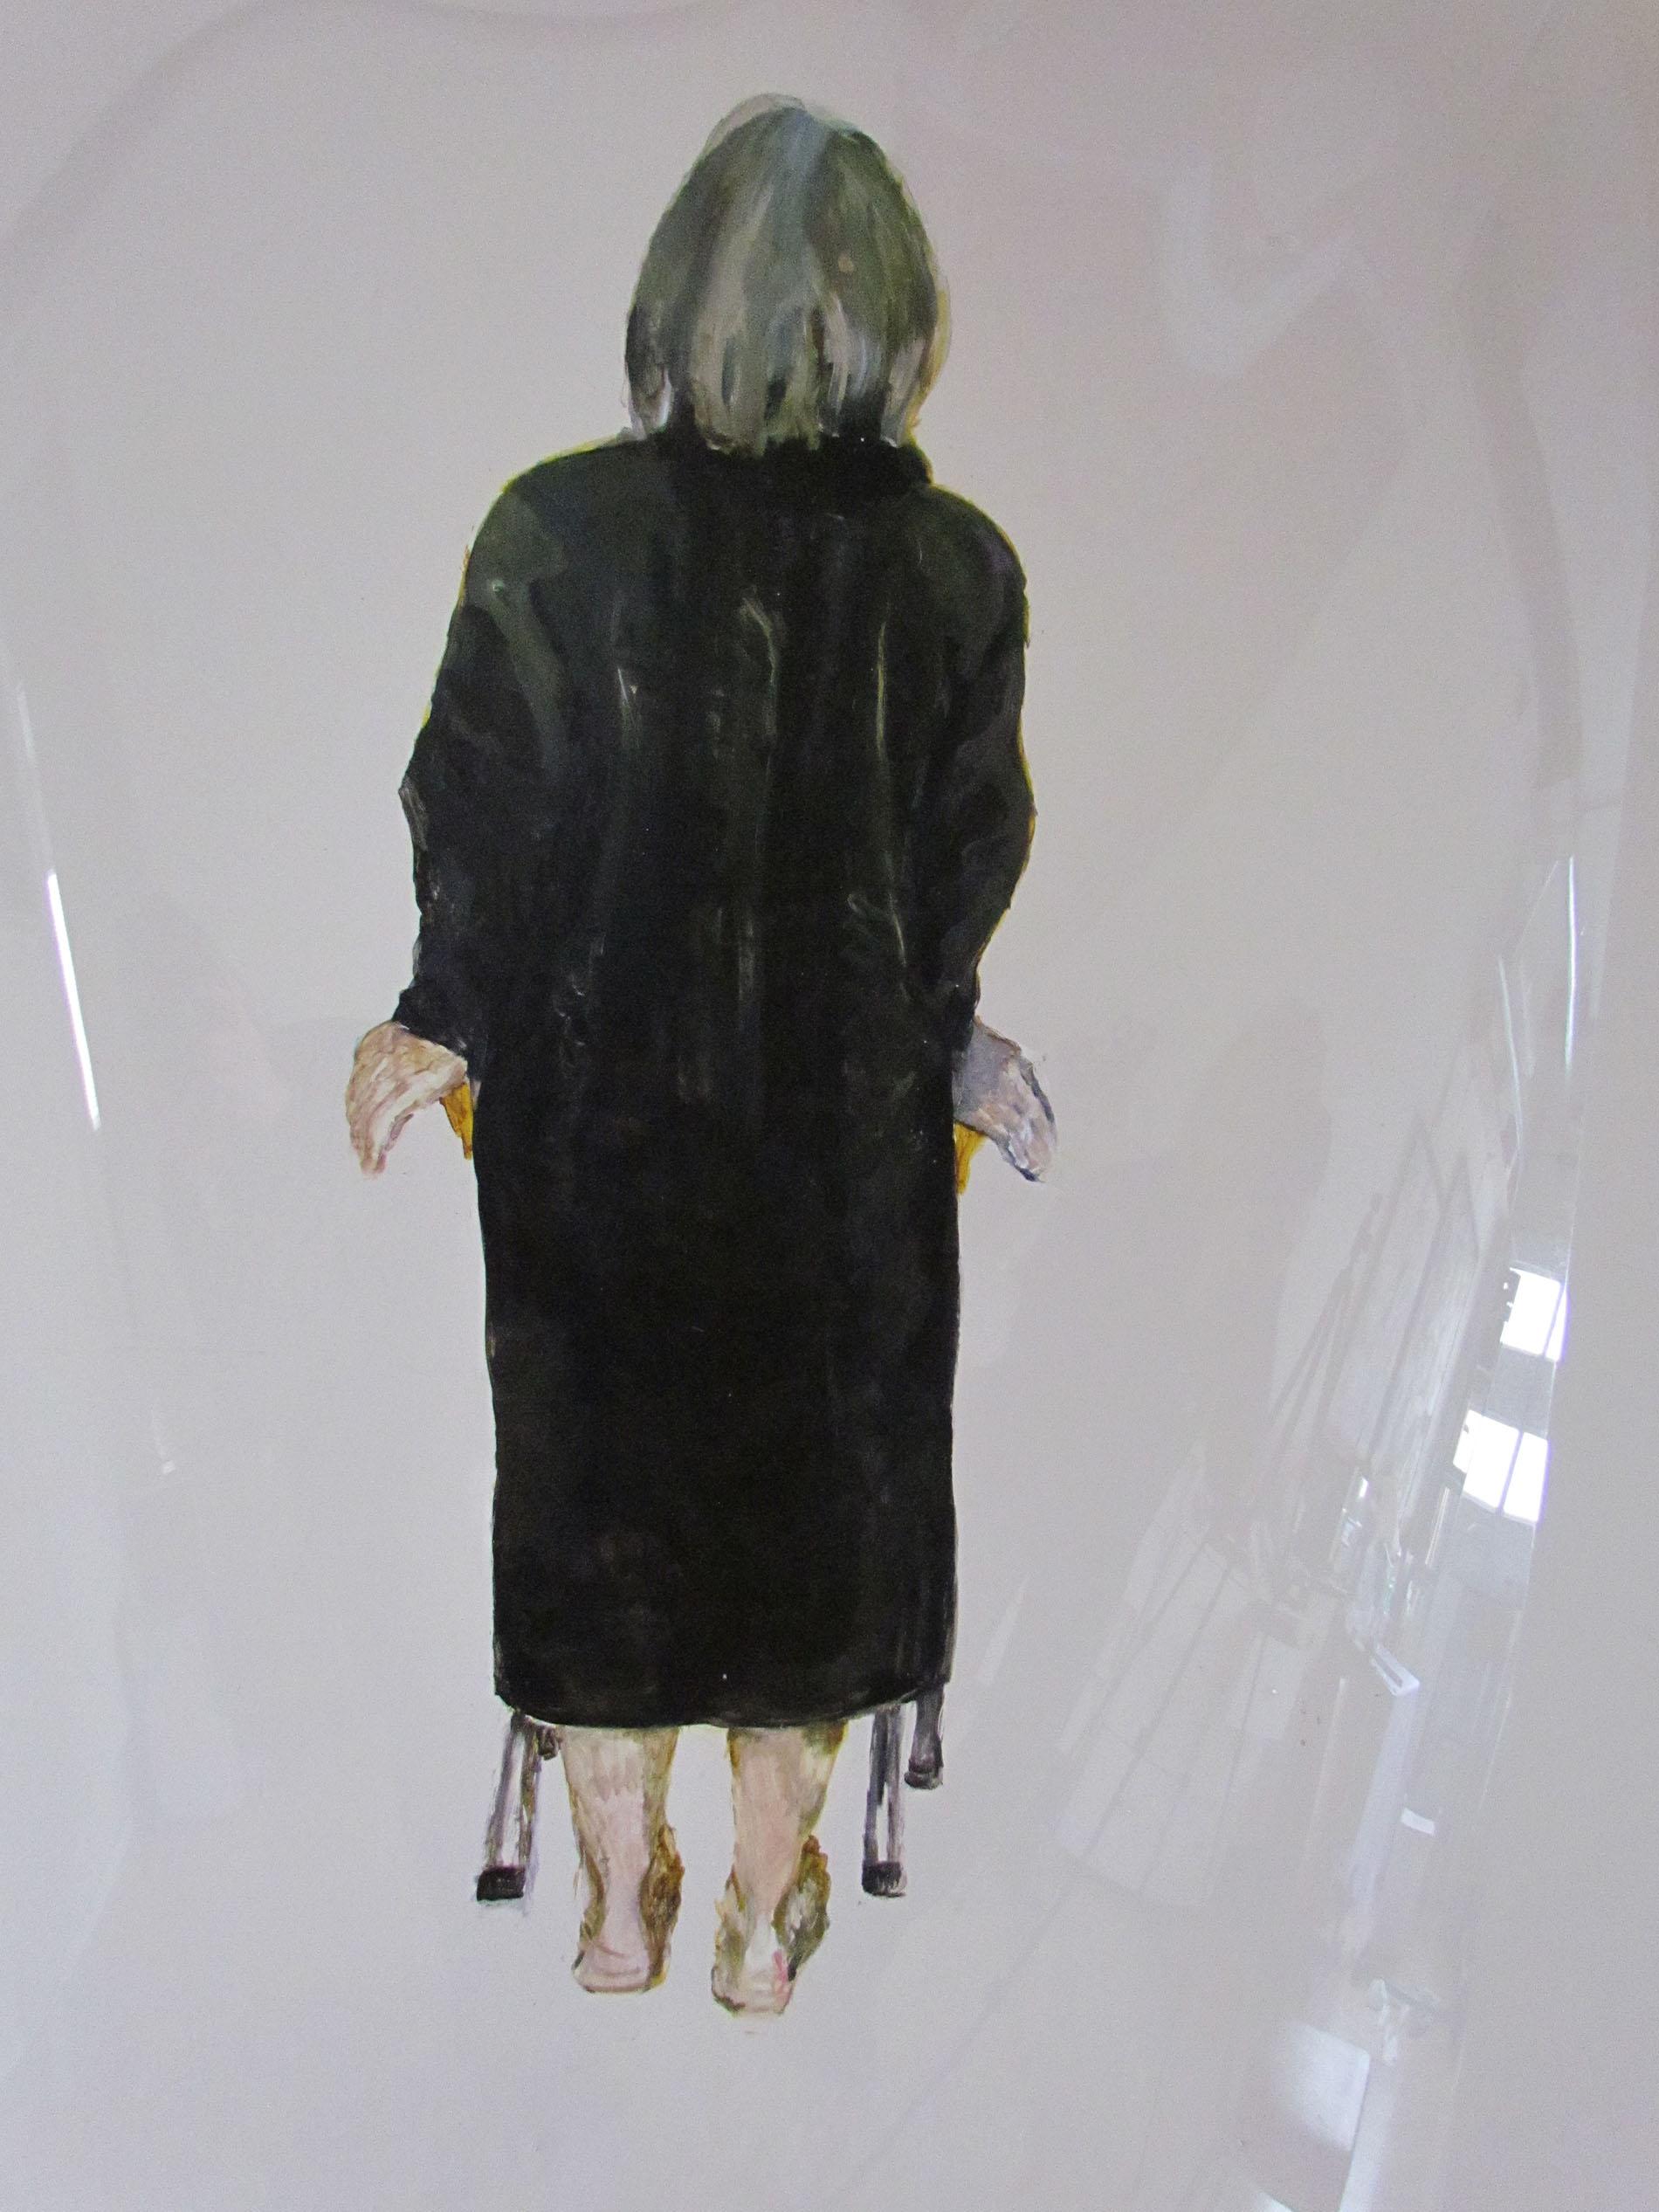 6 Grazyna Adamska Poised and Unbalanced 1 acrylic on lexan 48 x 30 inches